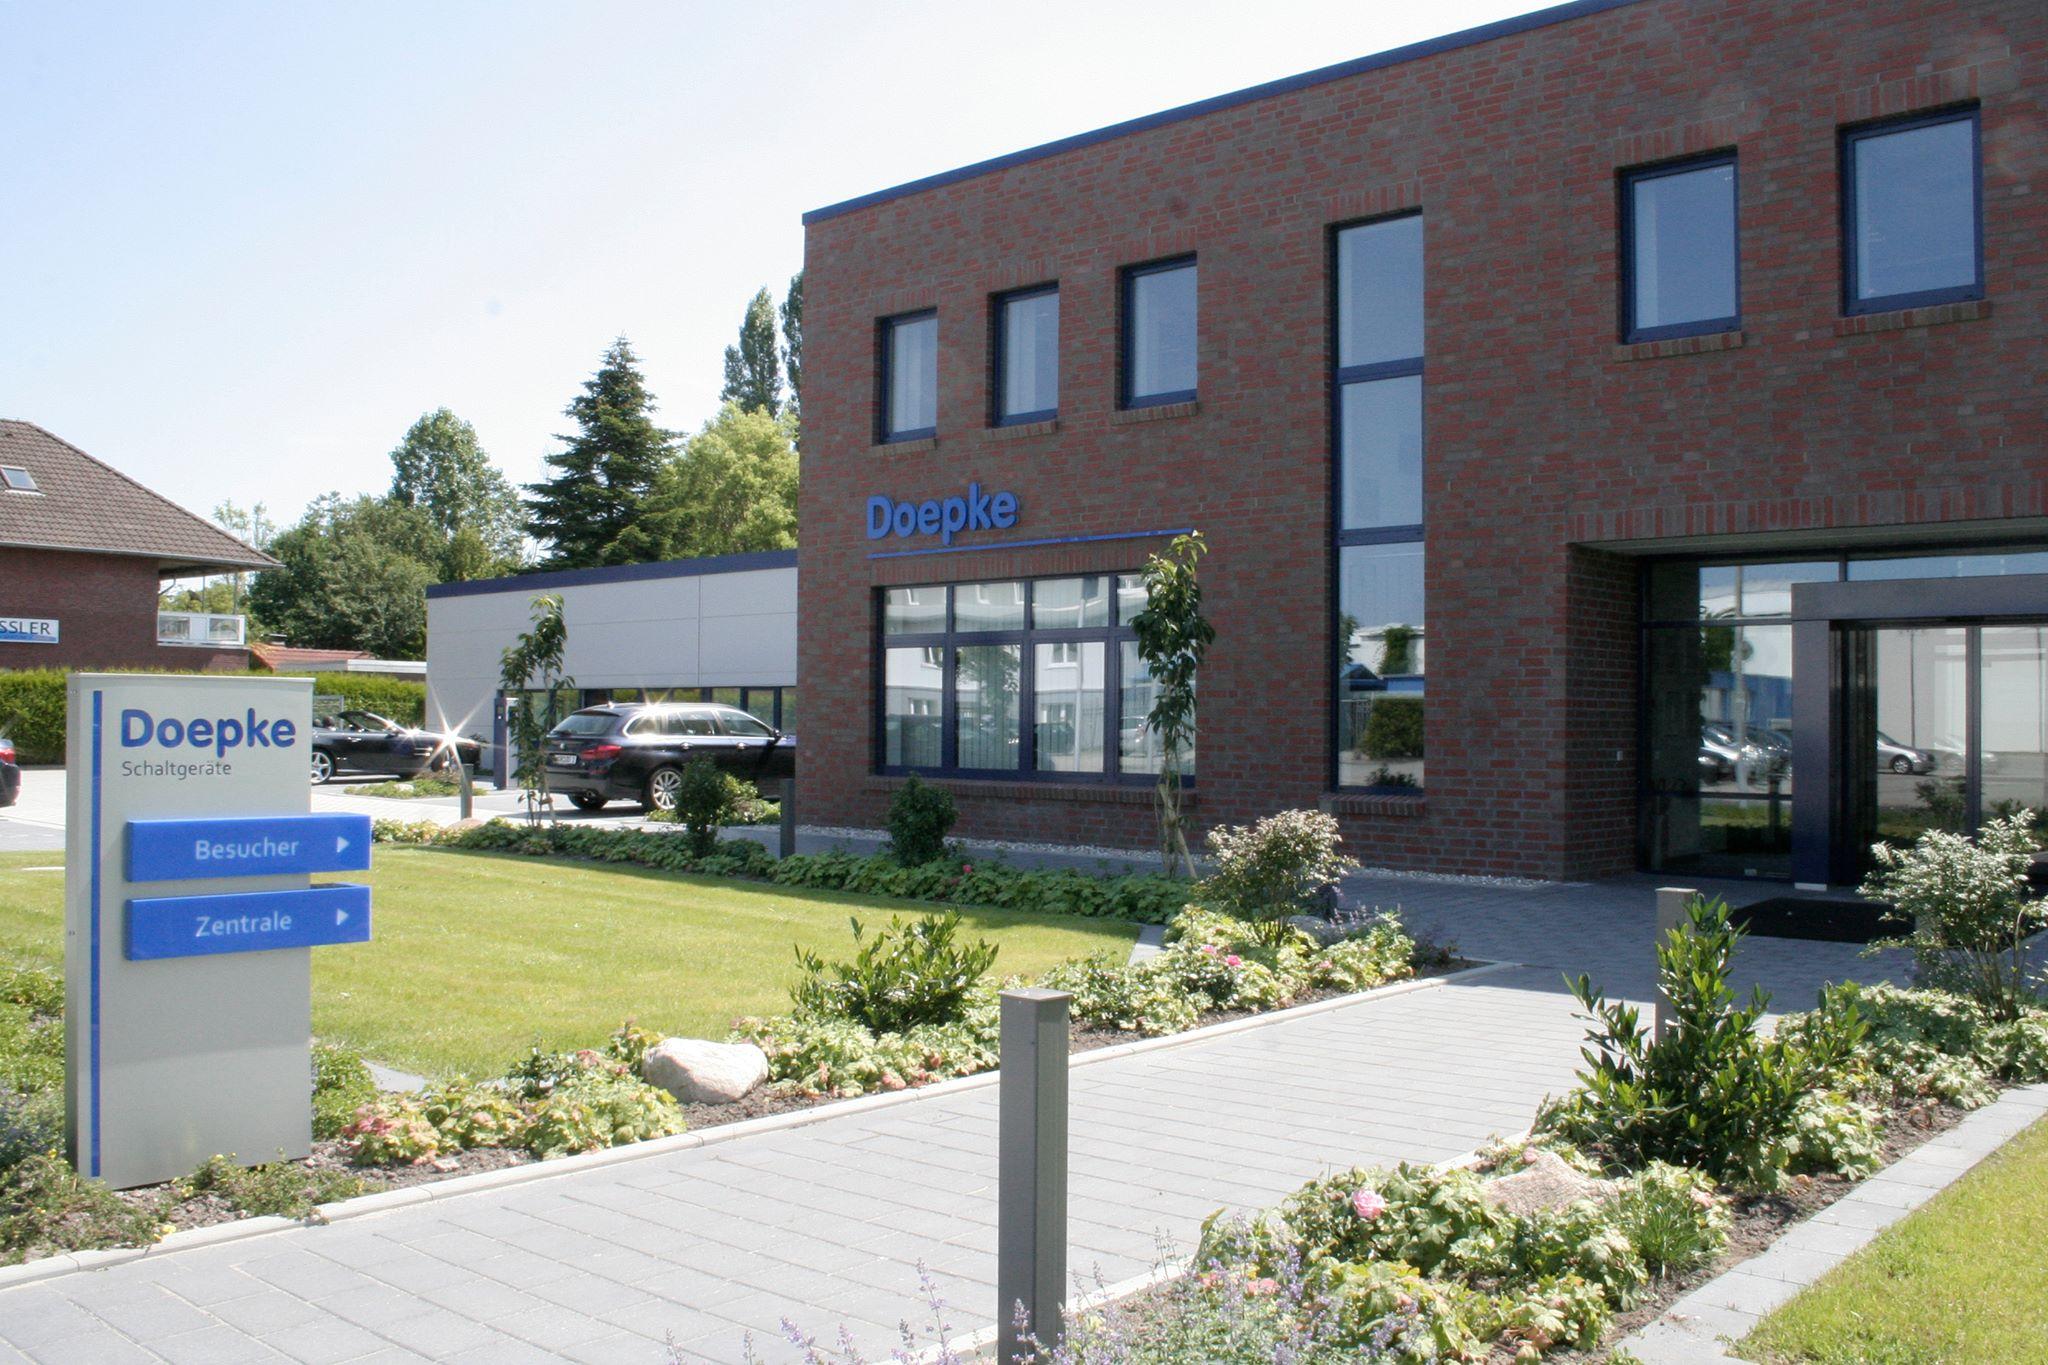 Profilbild Doepke Schaltgeräte GmbH